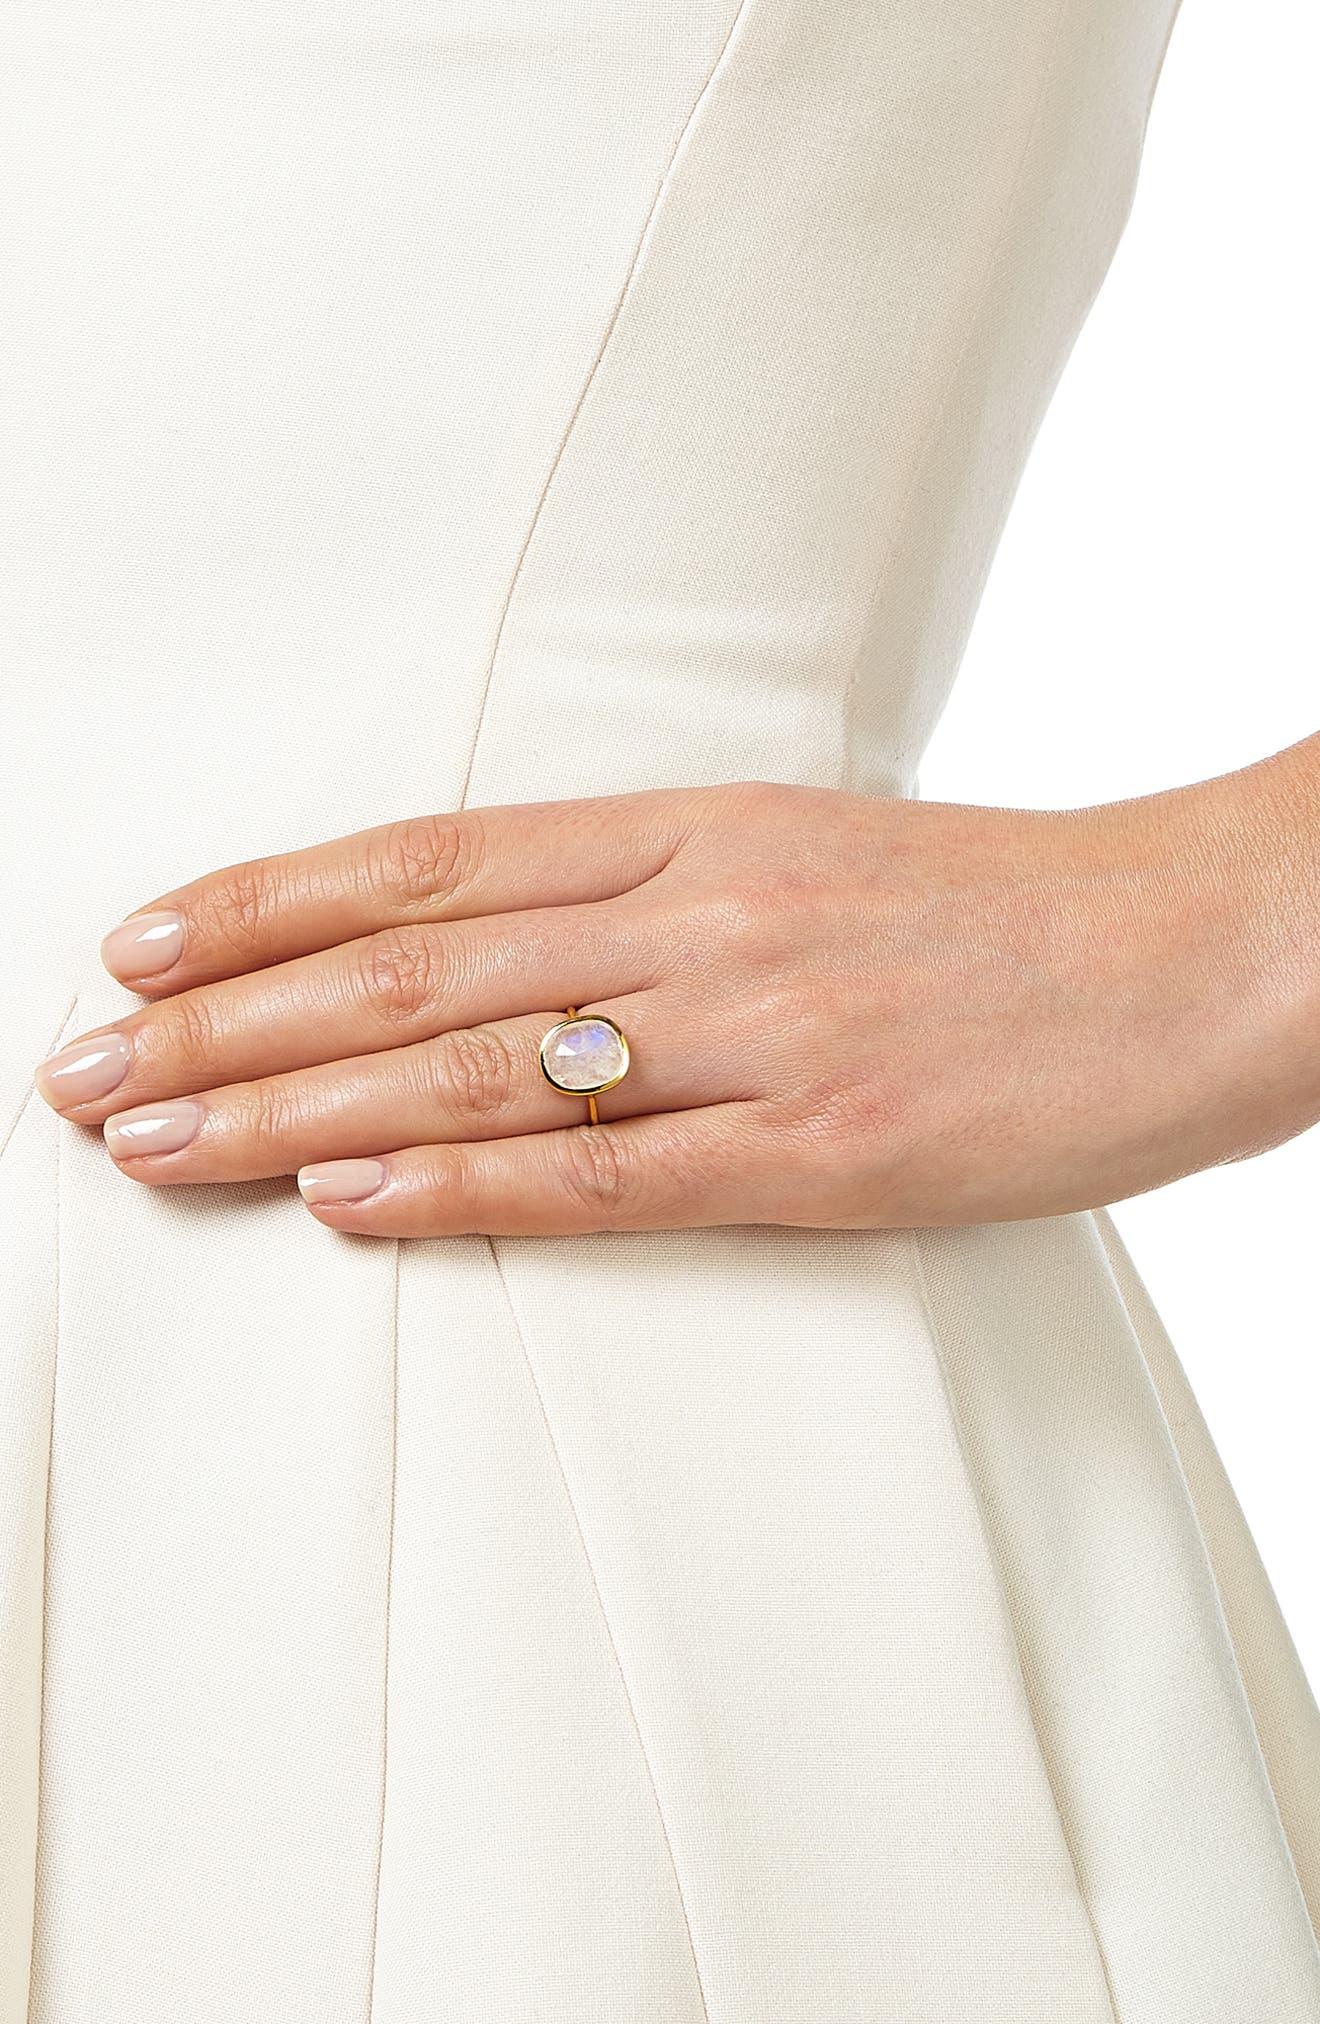 MONICA VINADER, Siren Semiprecious Stone Ring, Alternate thumbnail 2, color, GOLD/ MOONSTONE